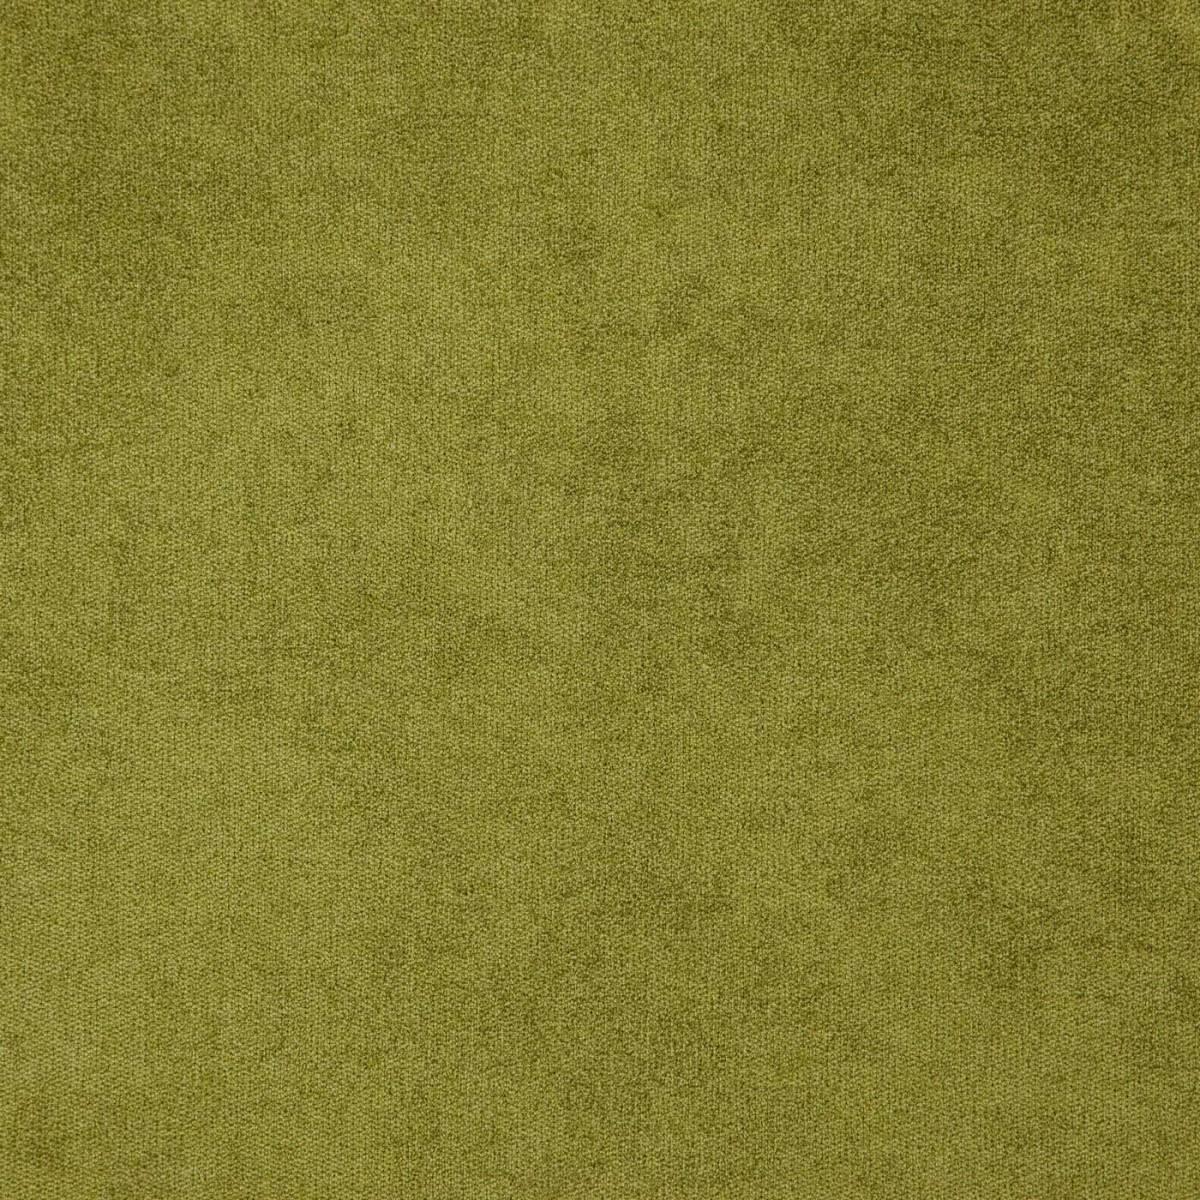 Greengage (3548/611)